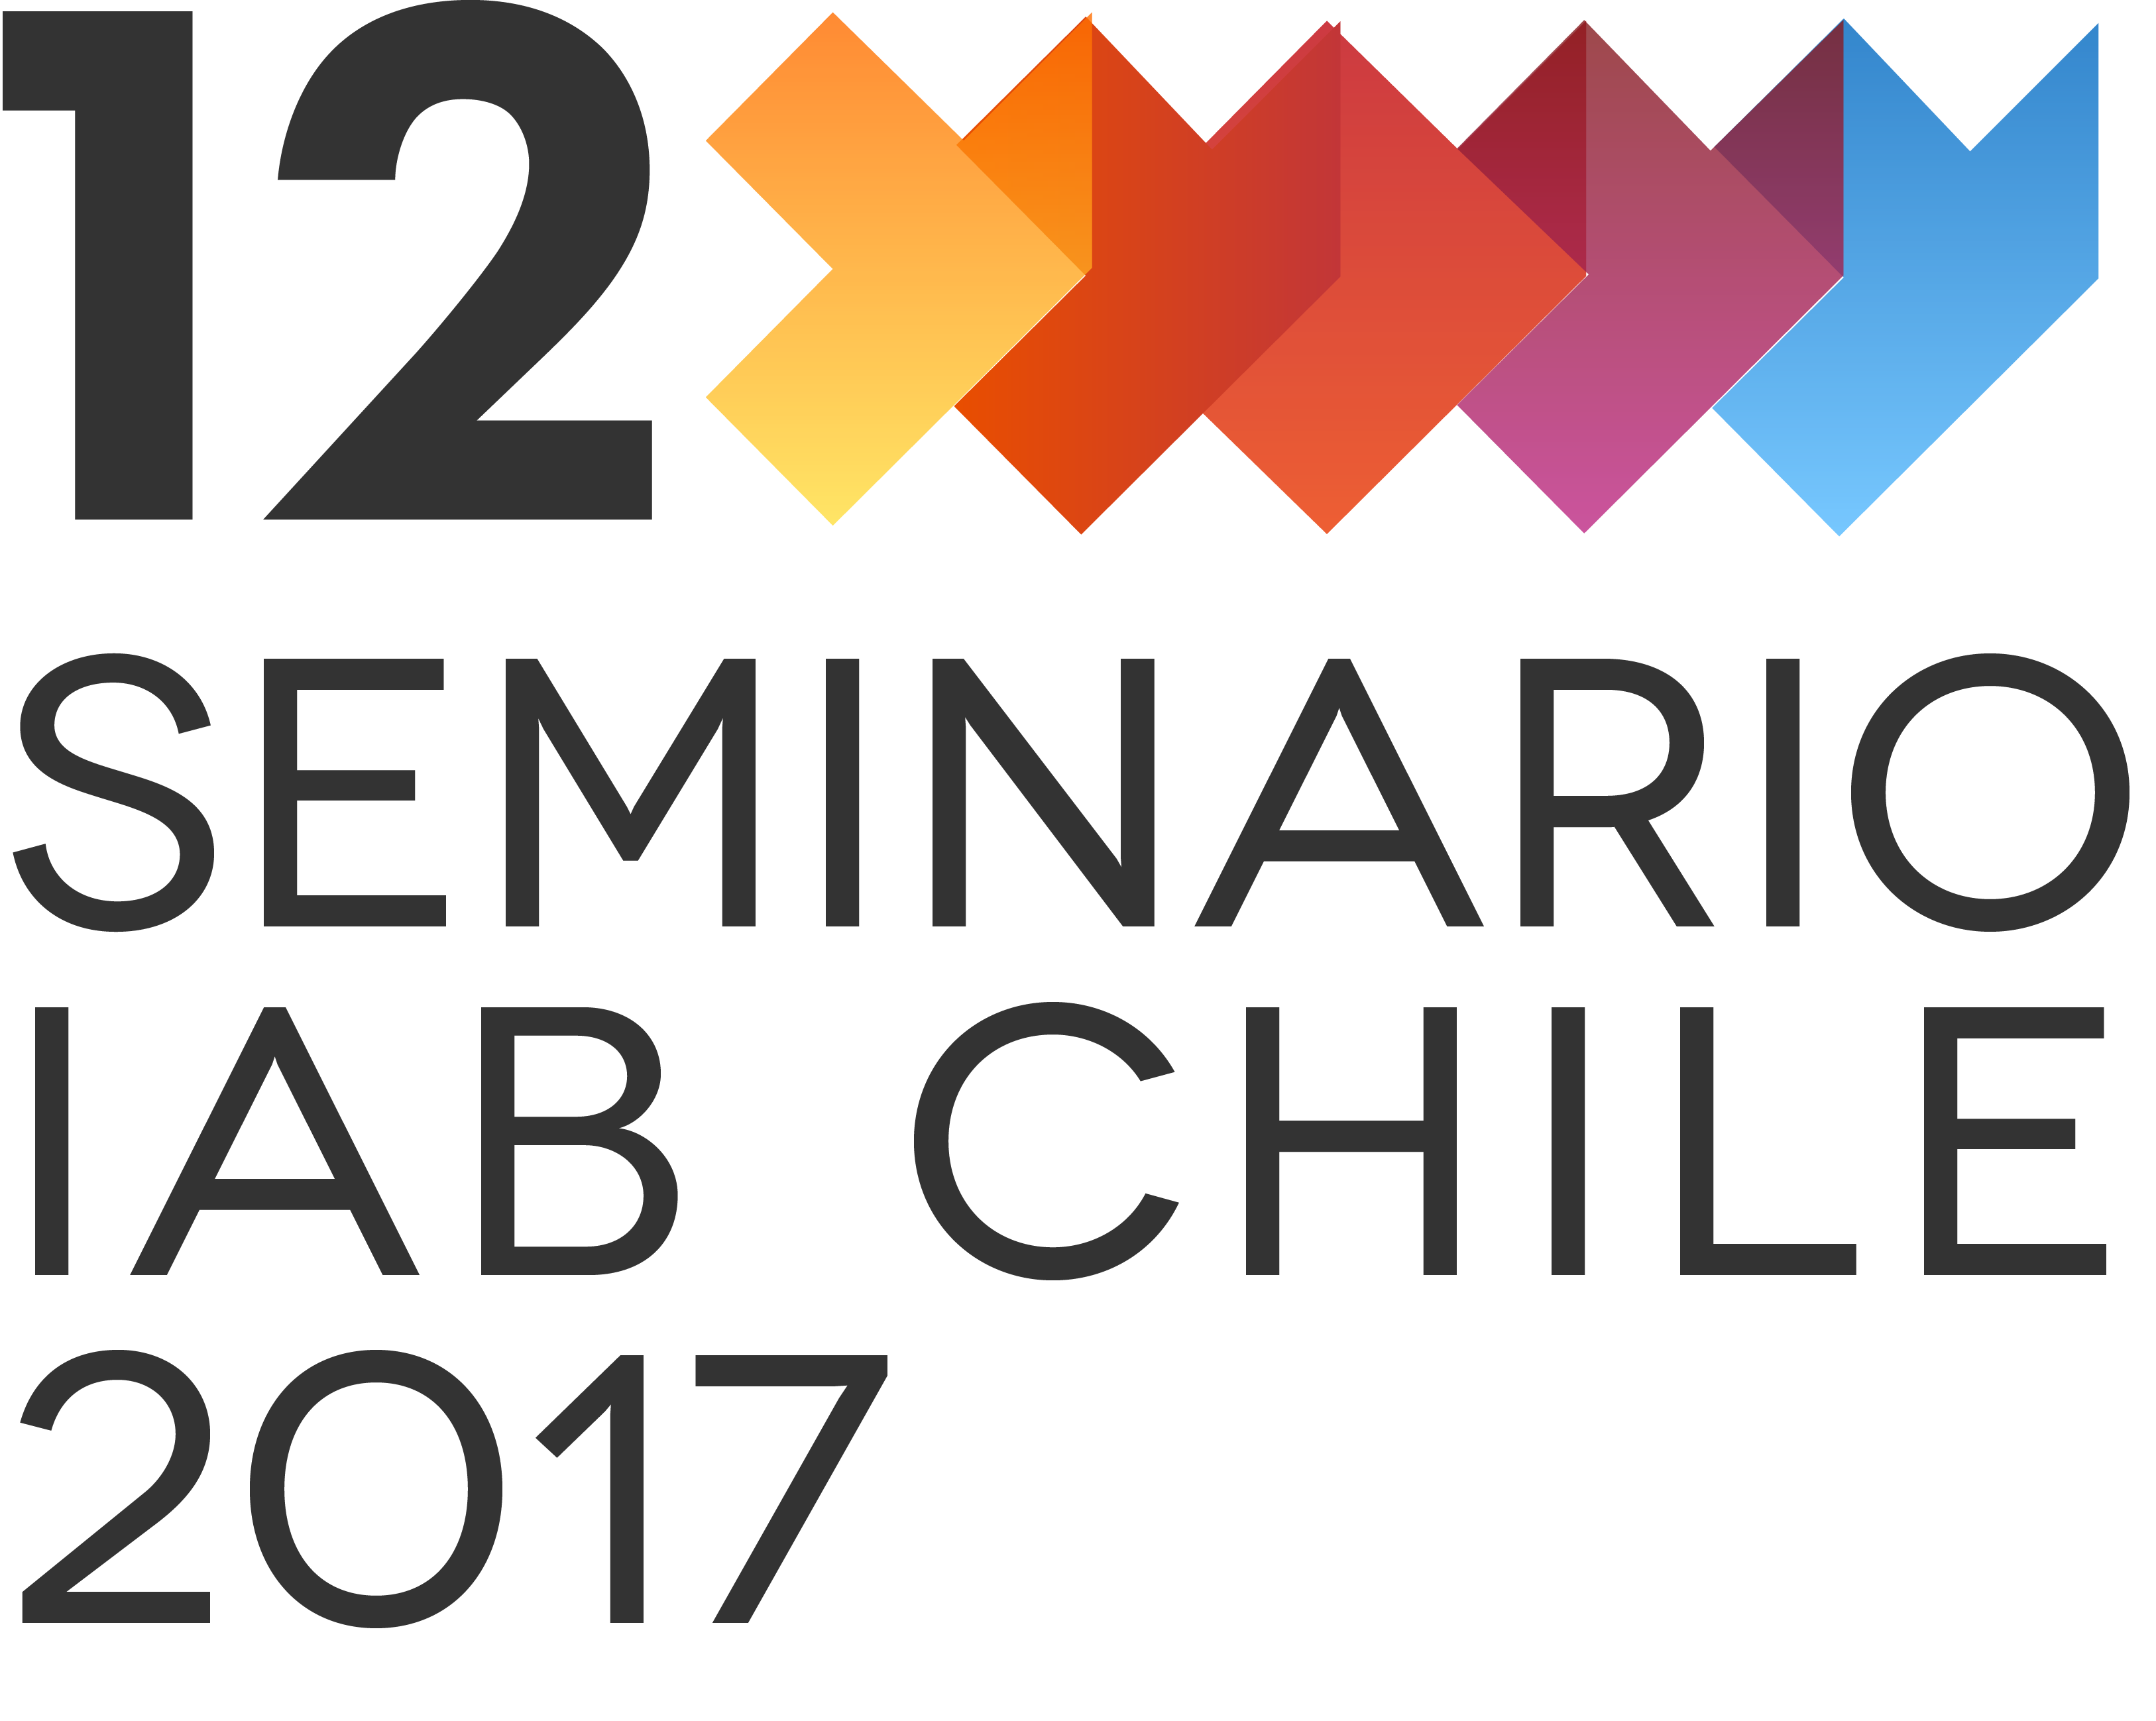 12 SEMINARIO IAB CHILE 2017